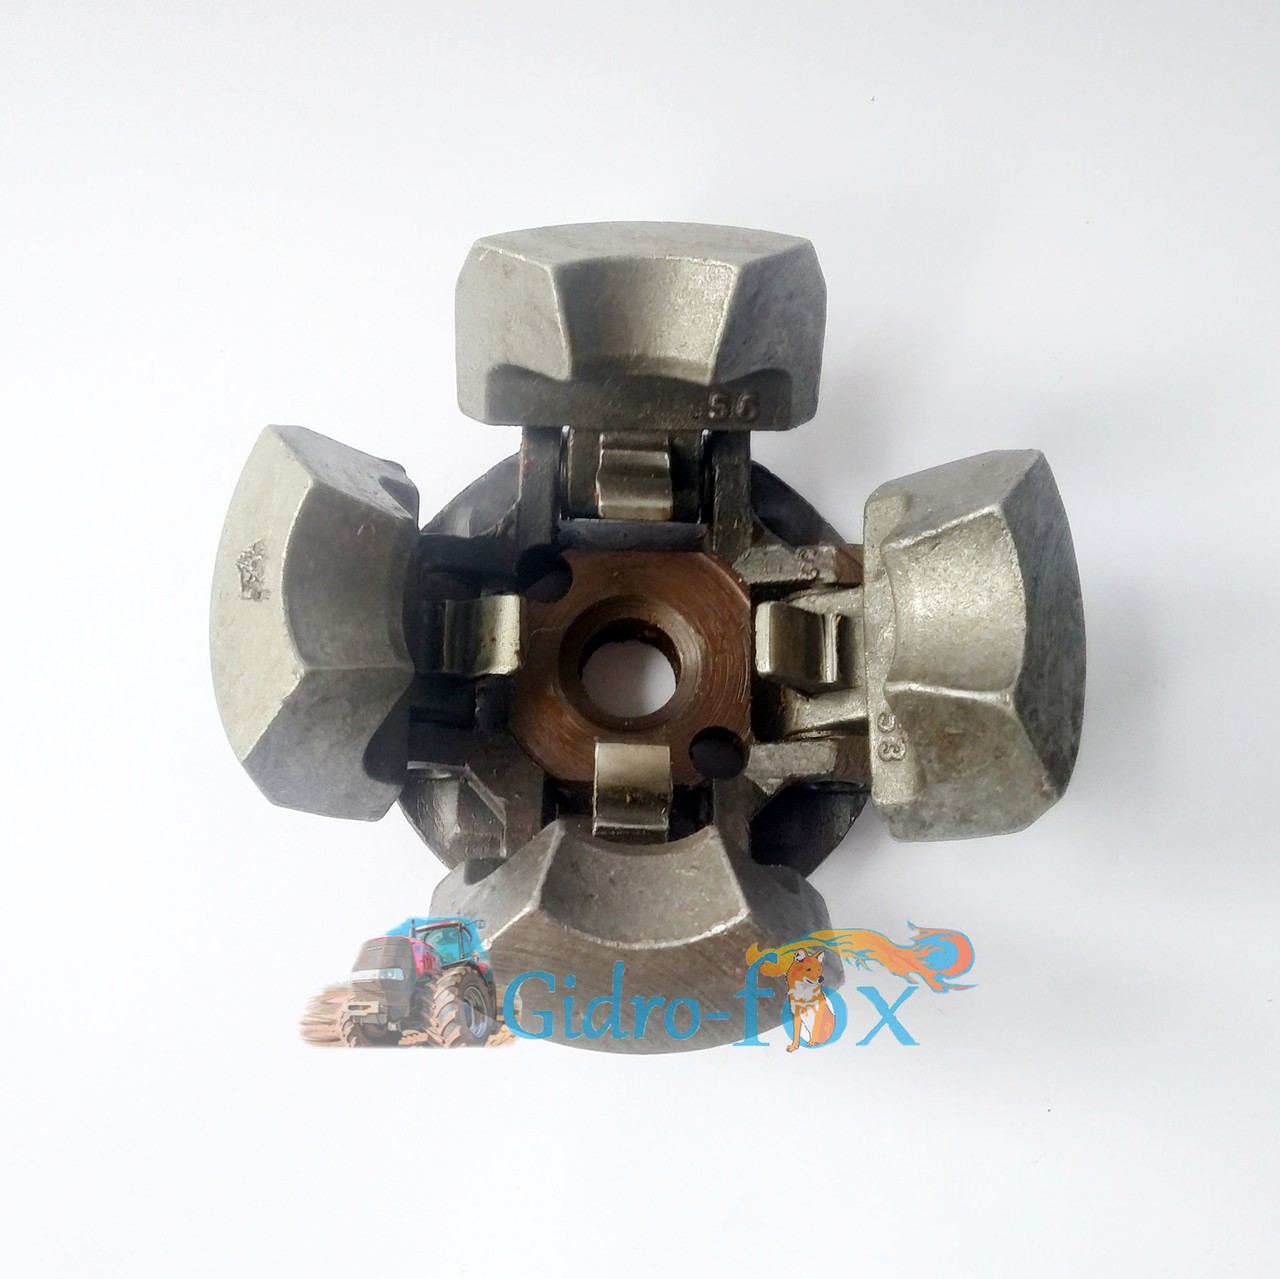 Ступица грузов (груз регулятора) в сборе ЮМЗ (Д-65) Кт.Н. УТН-5-1110160-ДСБ